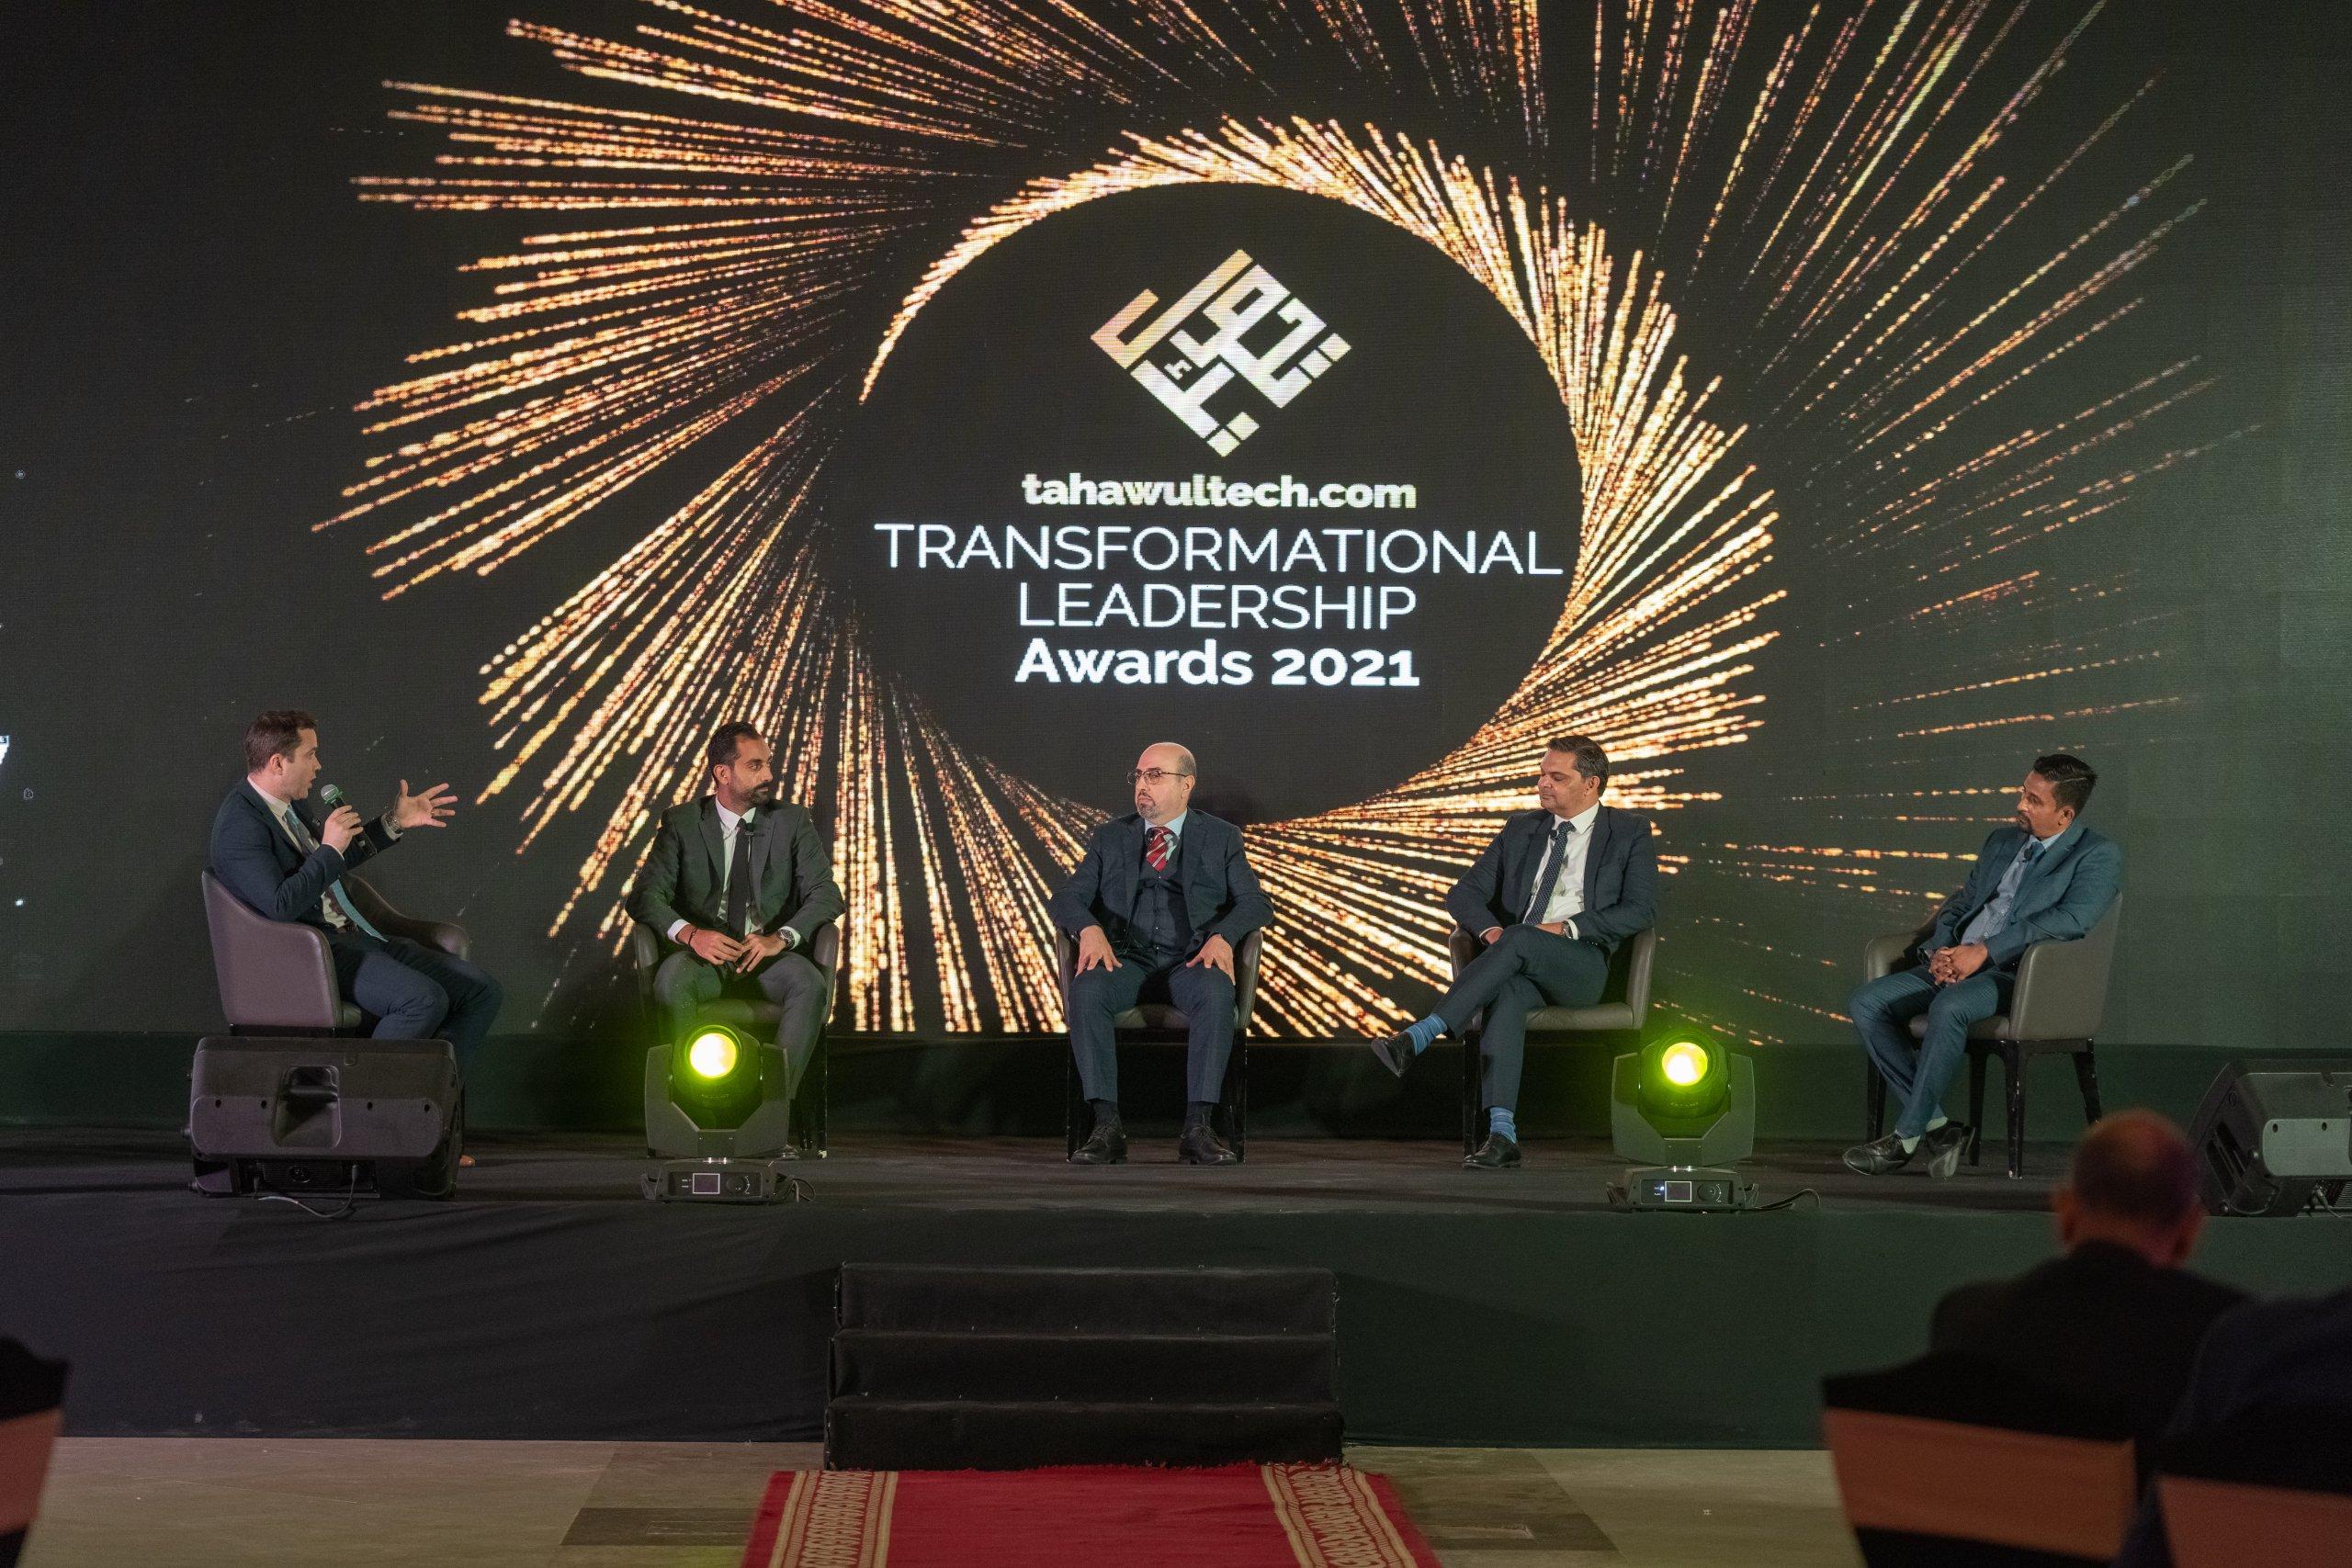 Transformational Leadership Awards 2021 Image Gallery